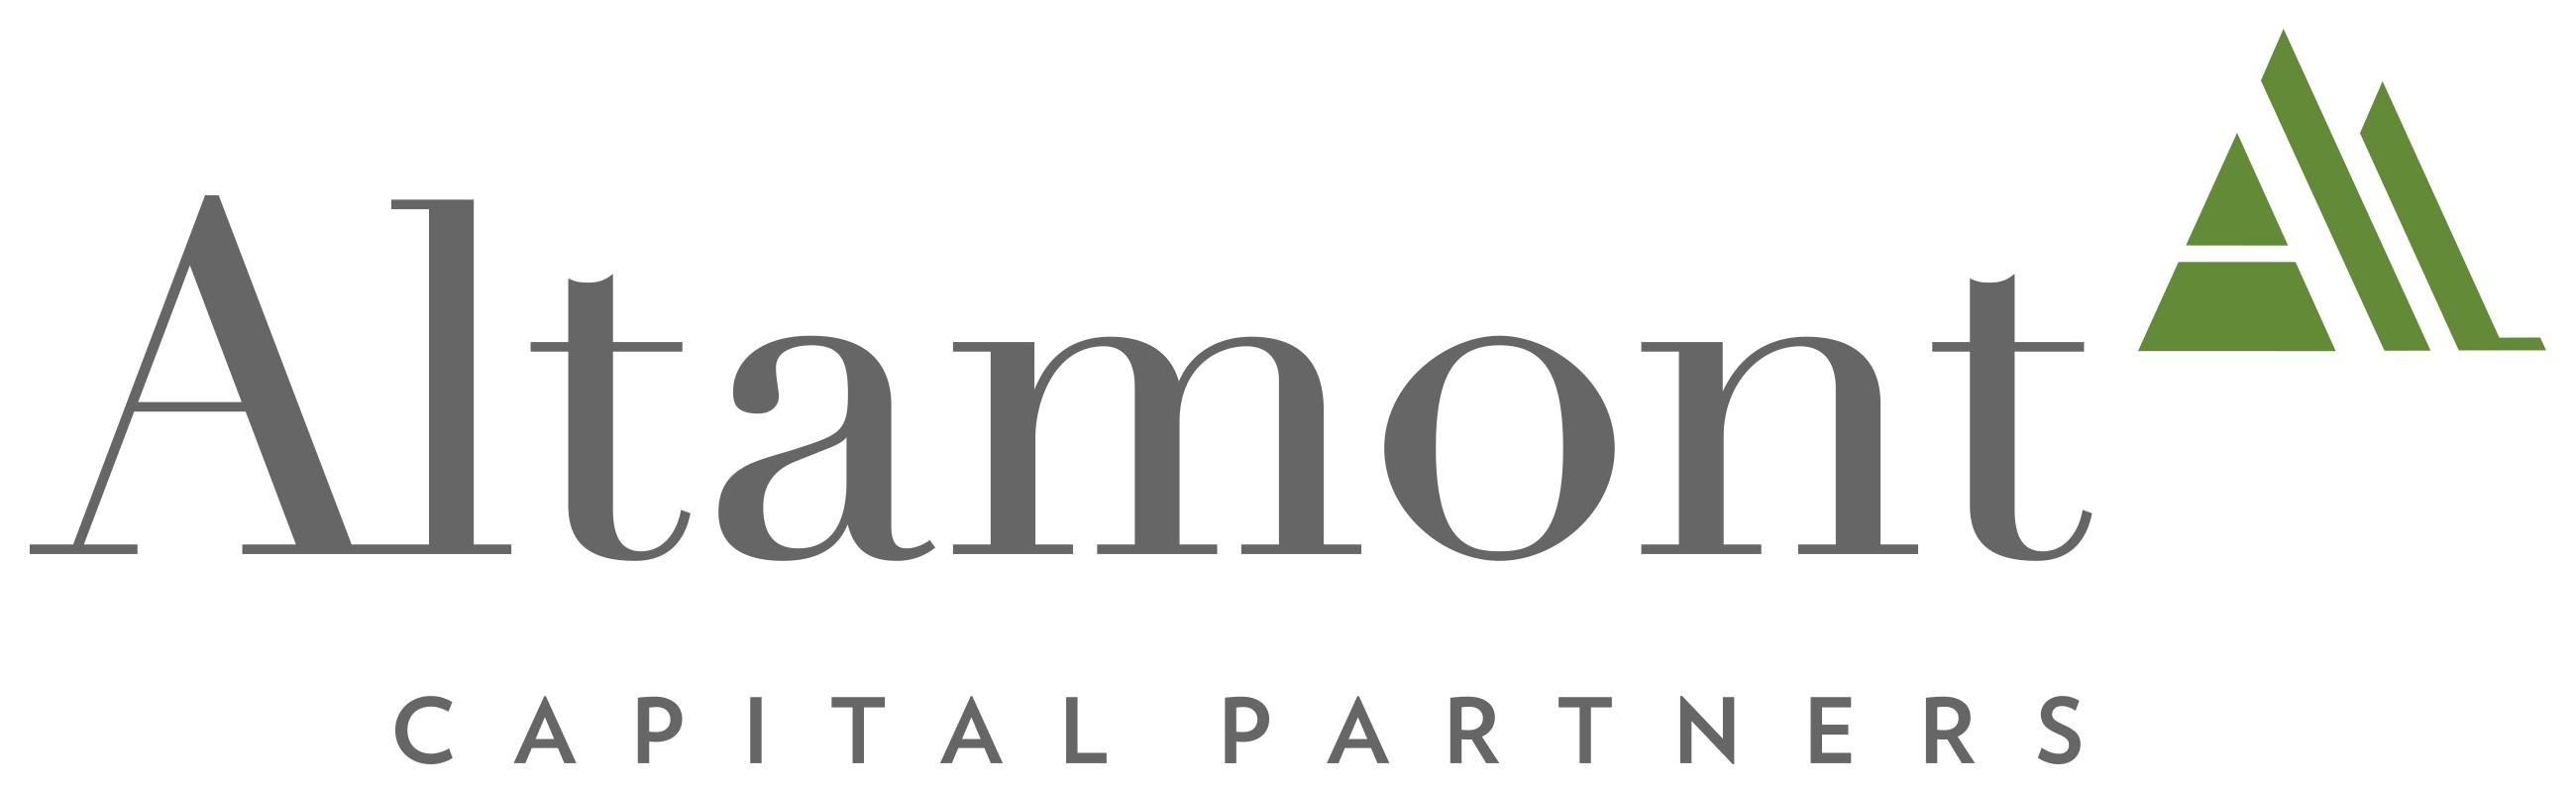 Altamont Capital Partners | LinkedIn